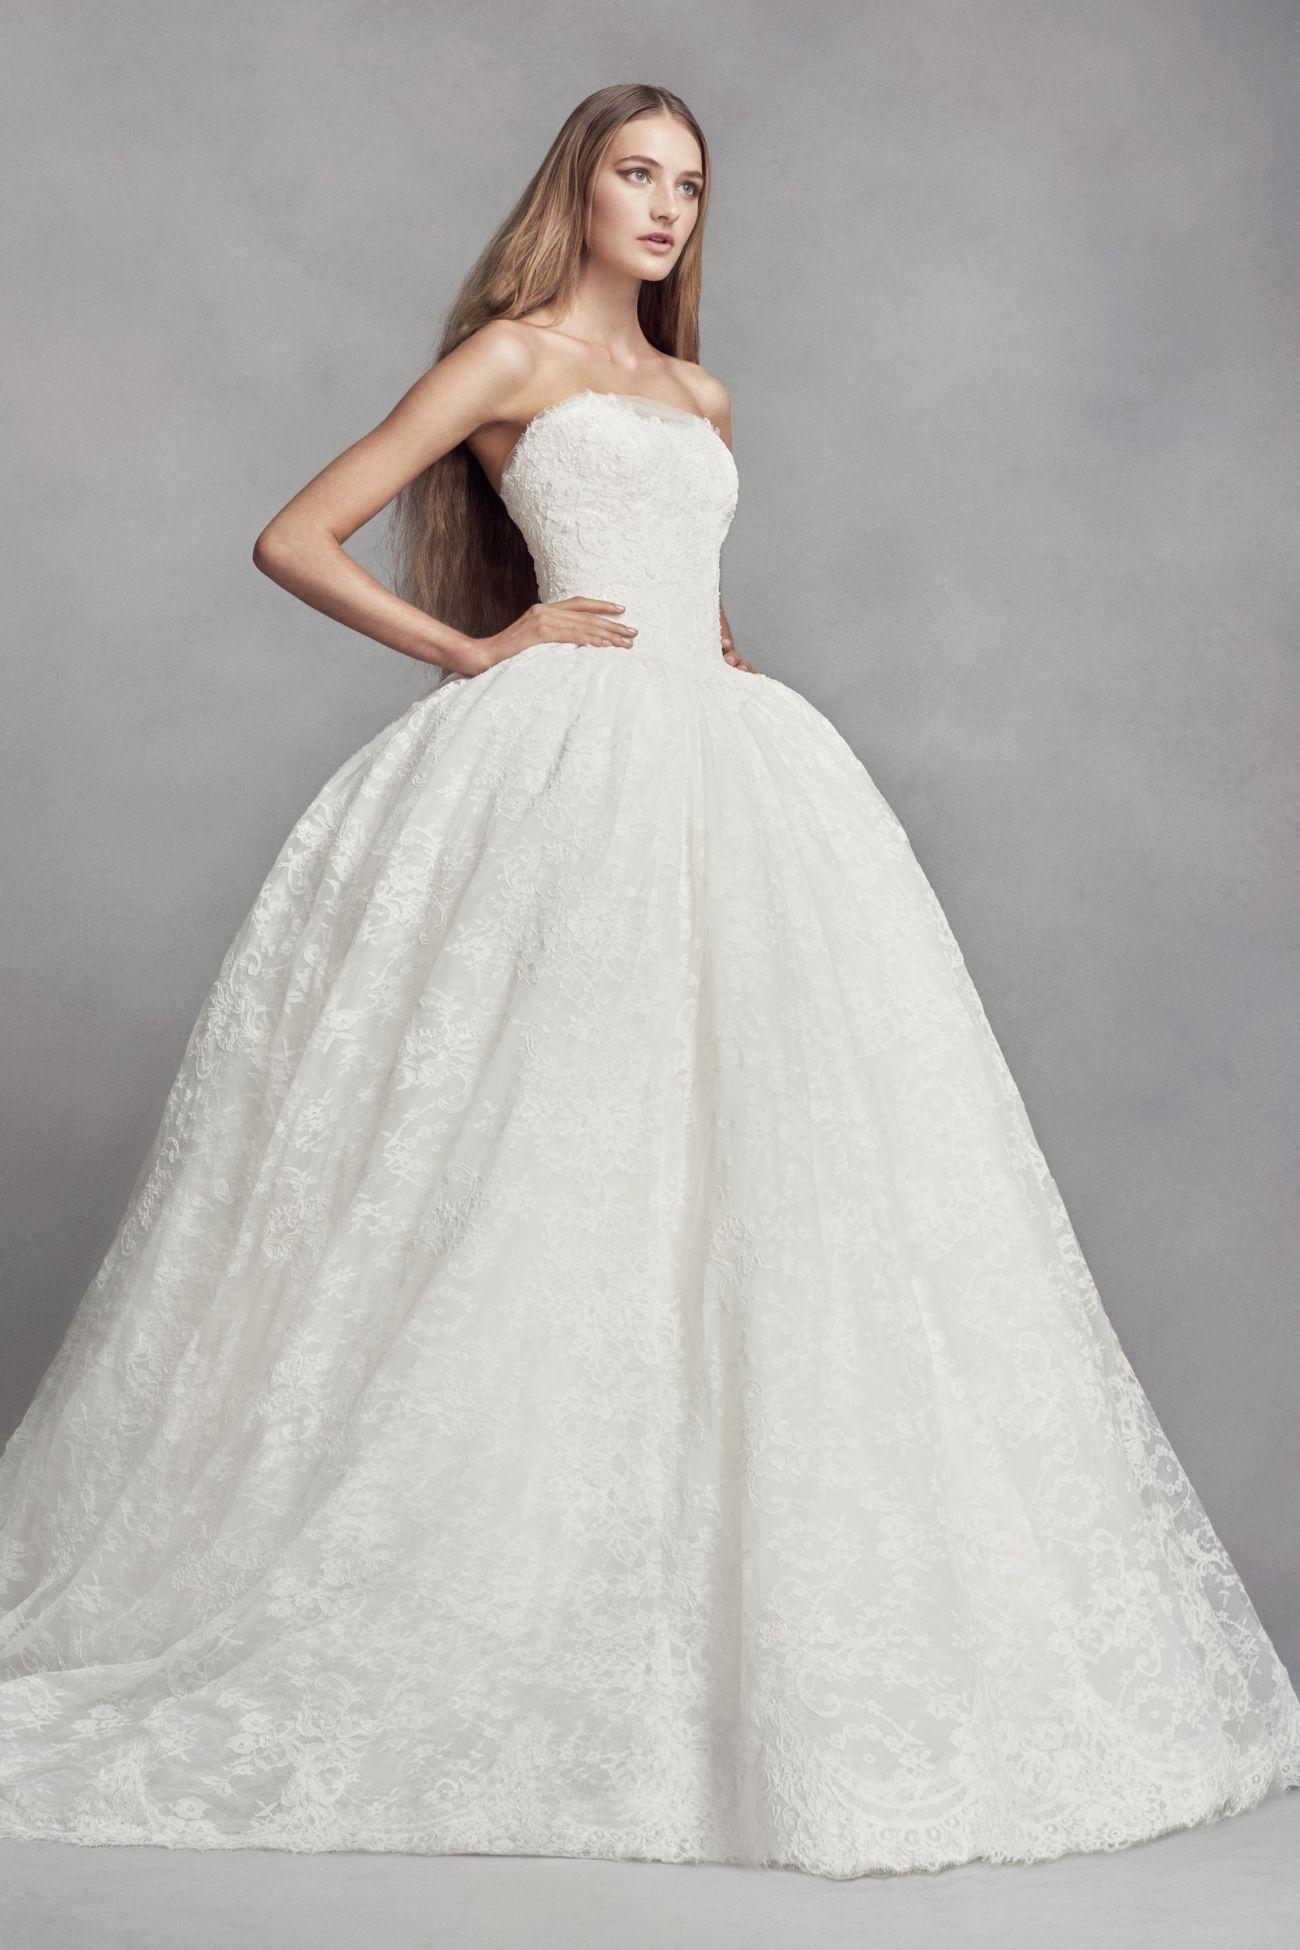 Wedding Dress Quiz.Wedding Dress Body Type Quiz